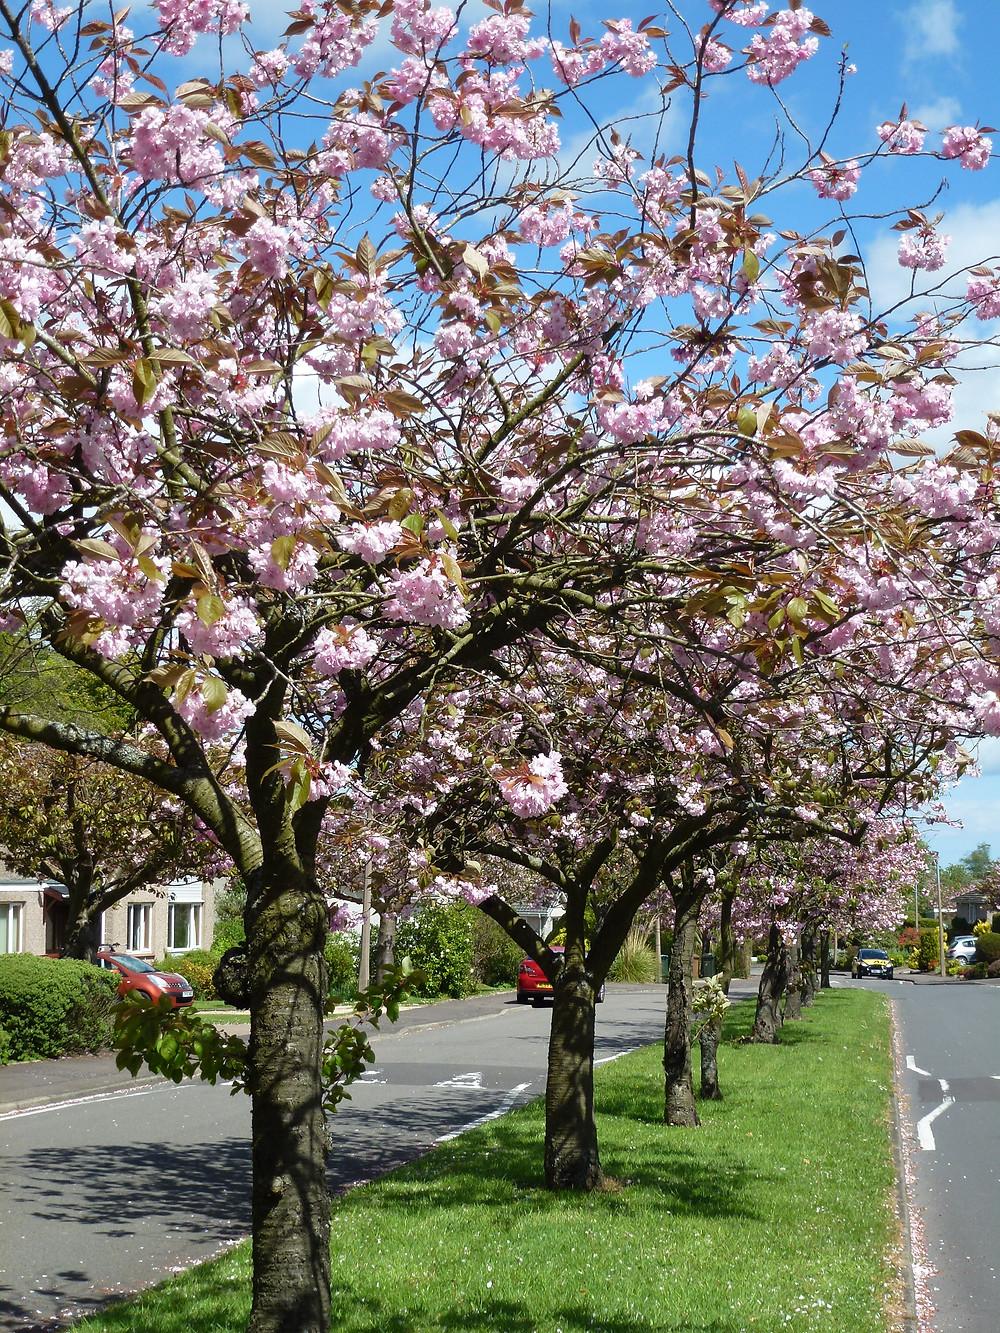 Cherry Tree area of Balerno, pesticide-free since 2018